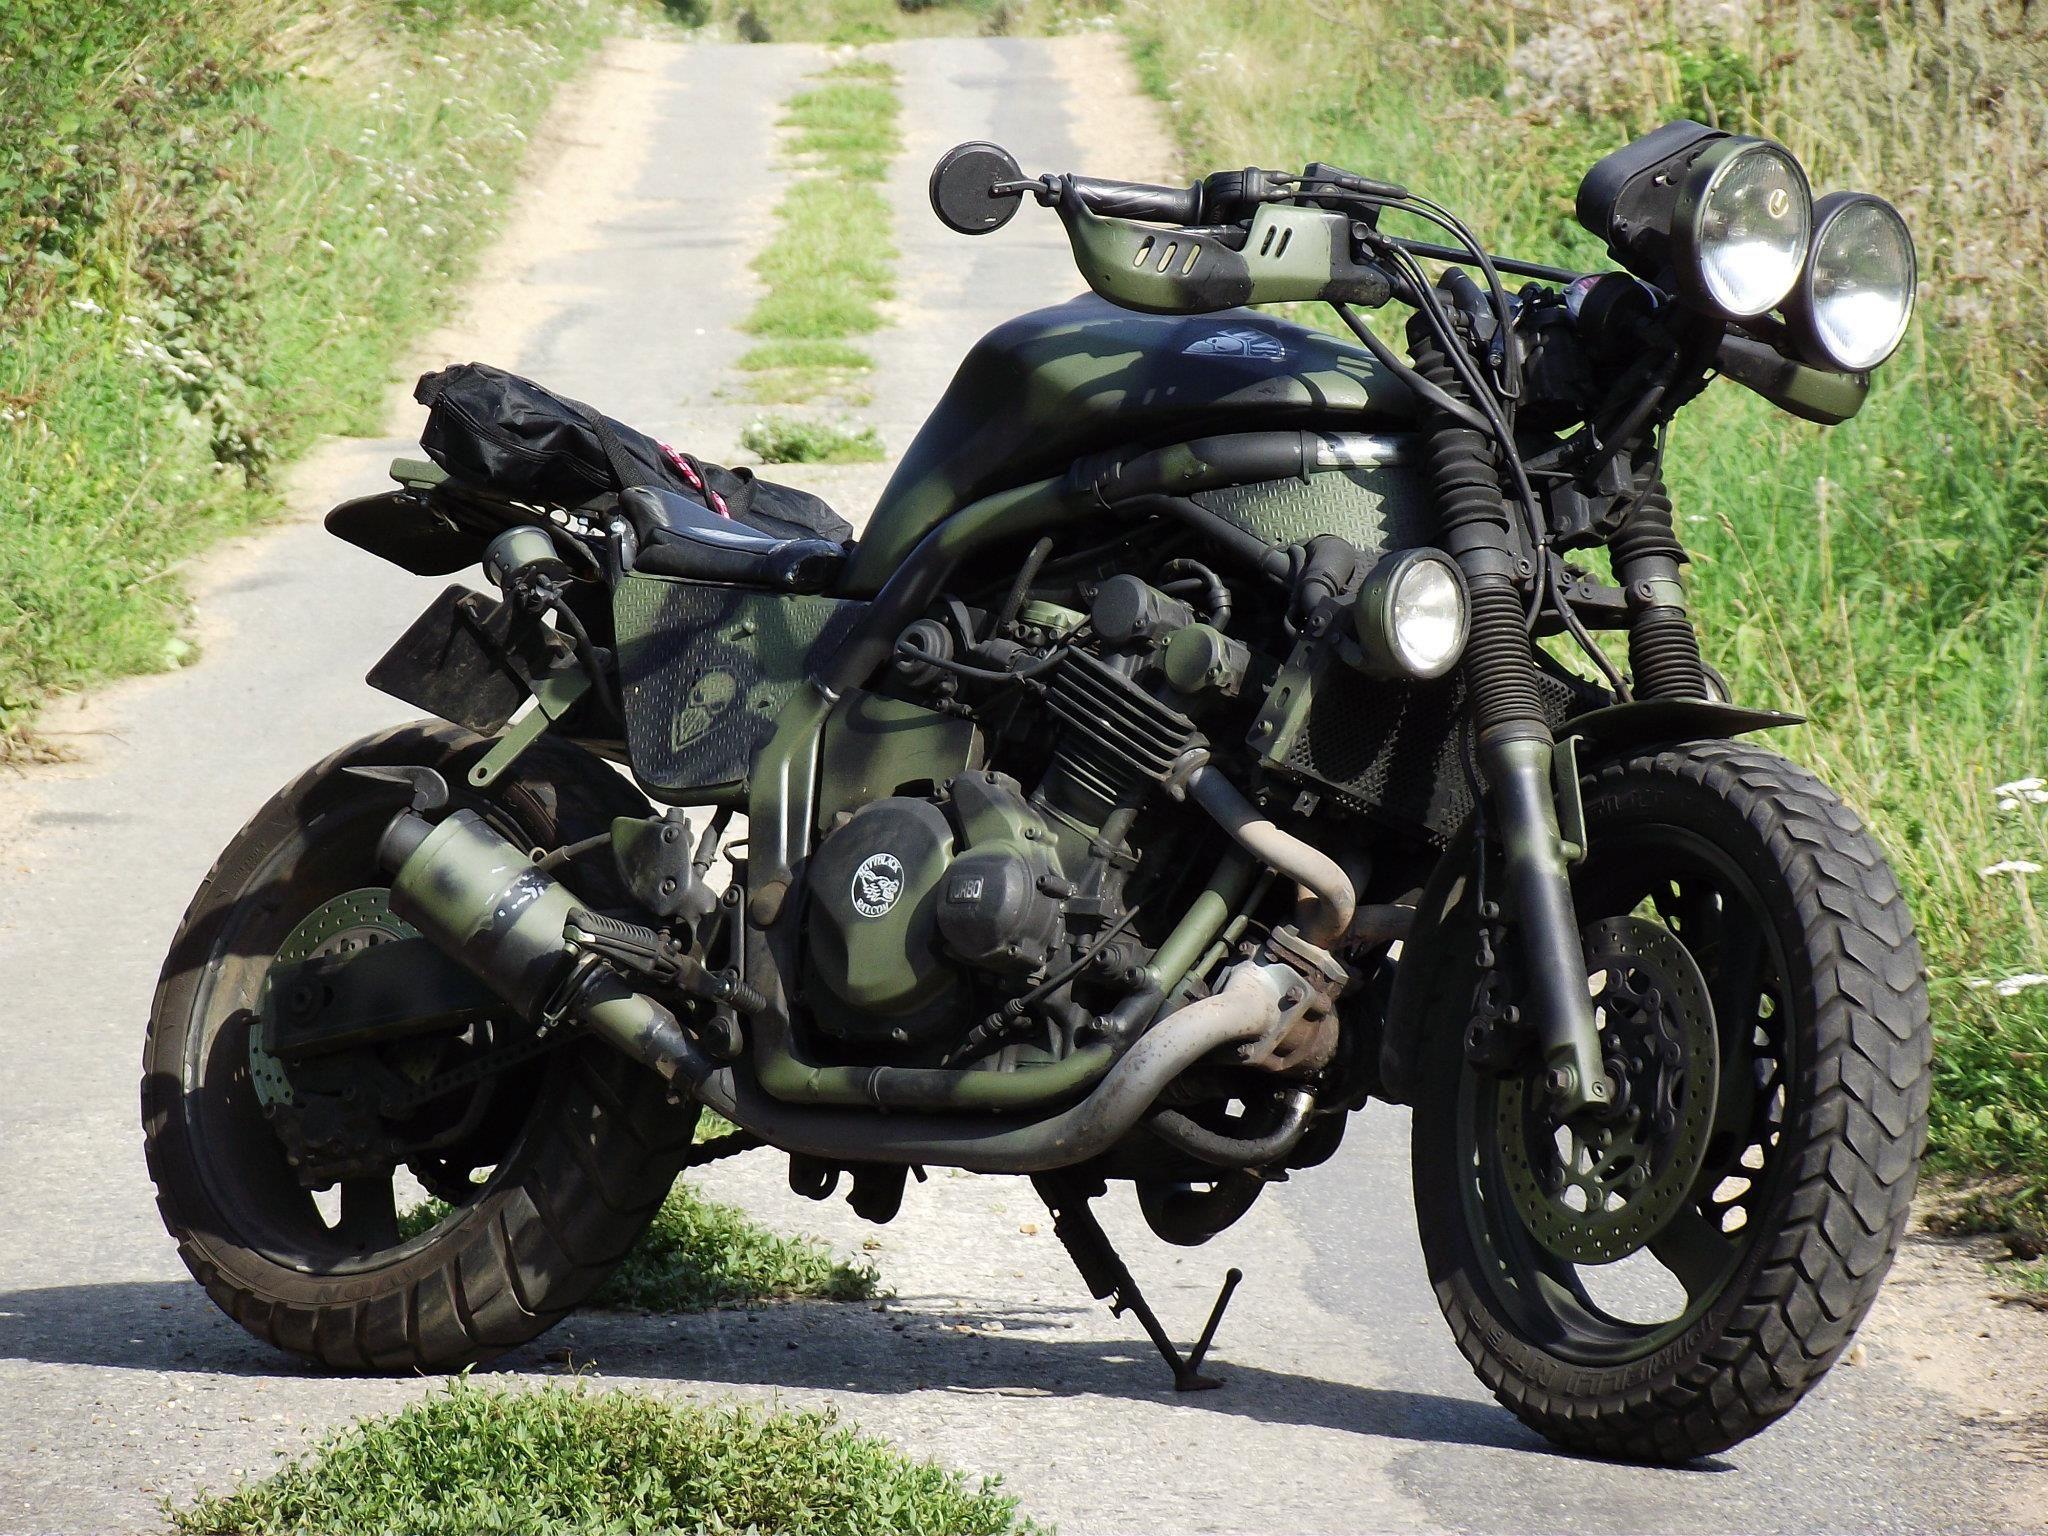 Military Rat Bike I Need This Bike Ratbikes